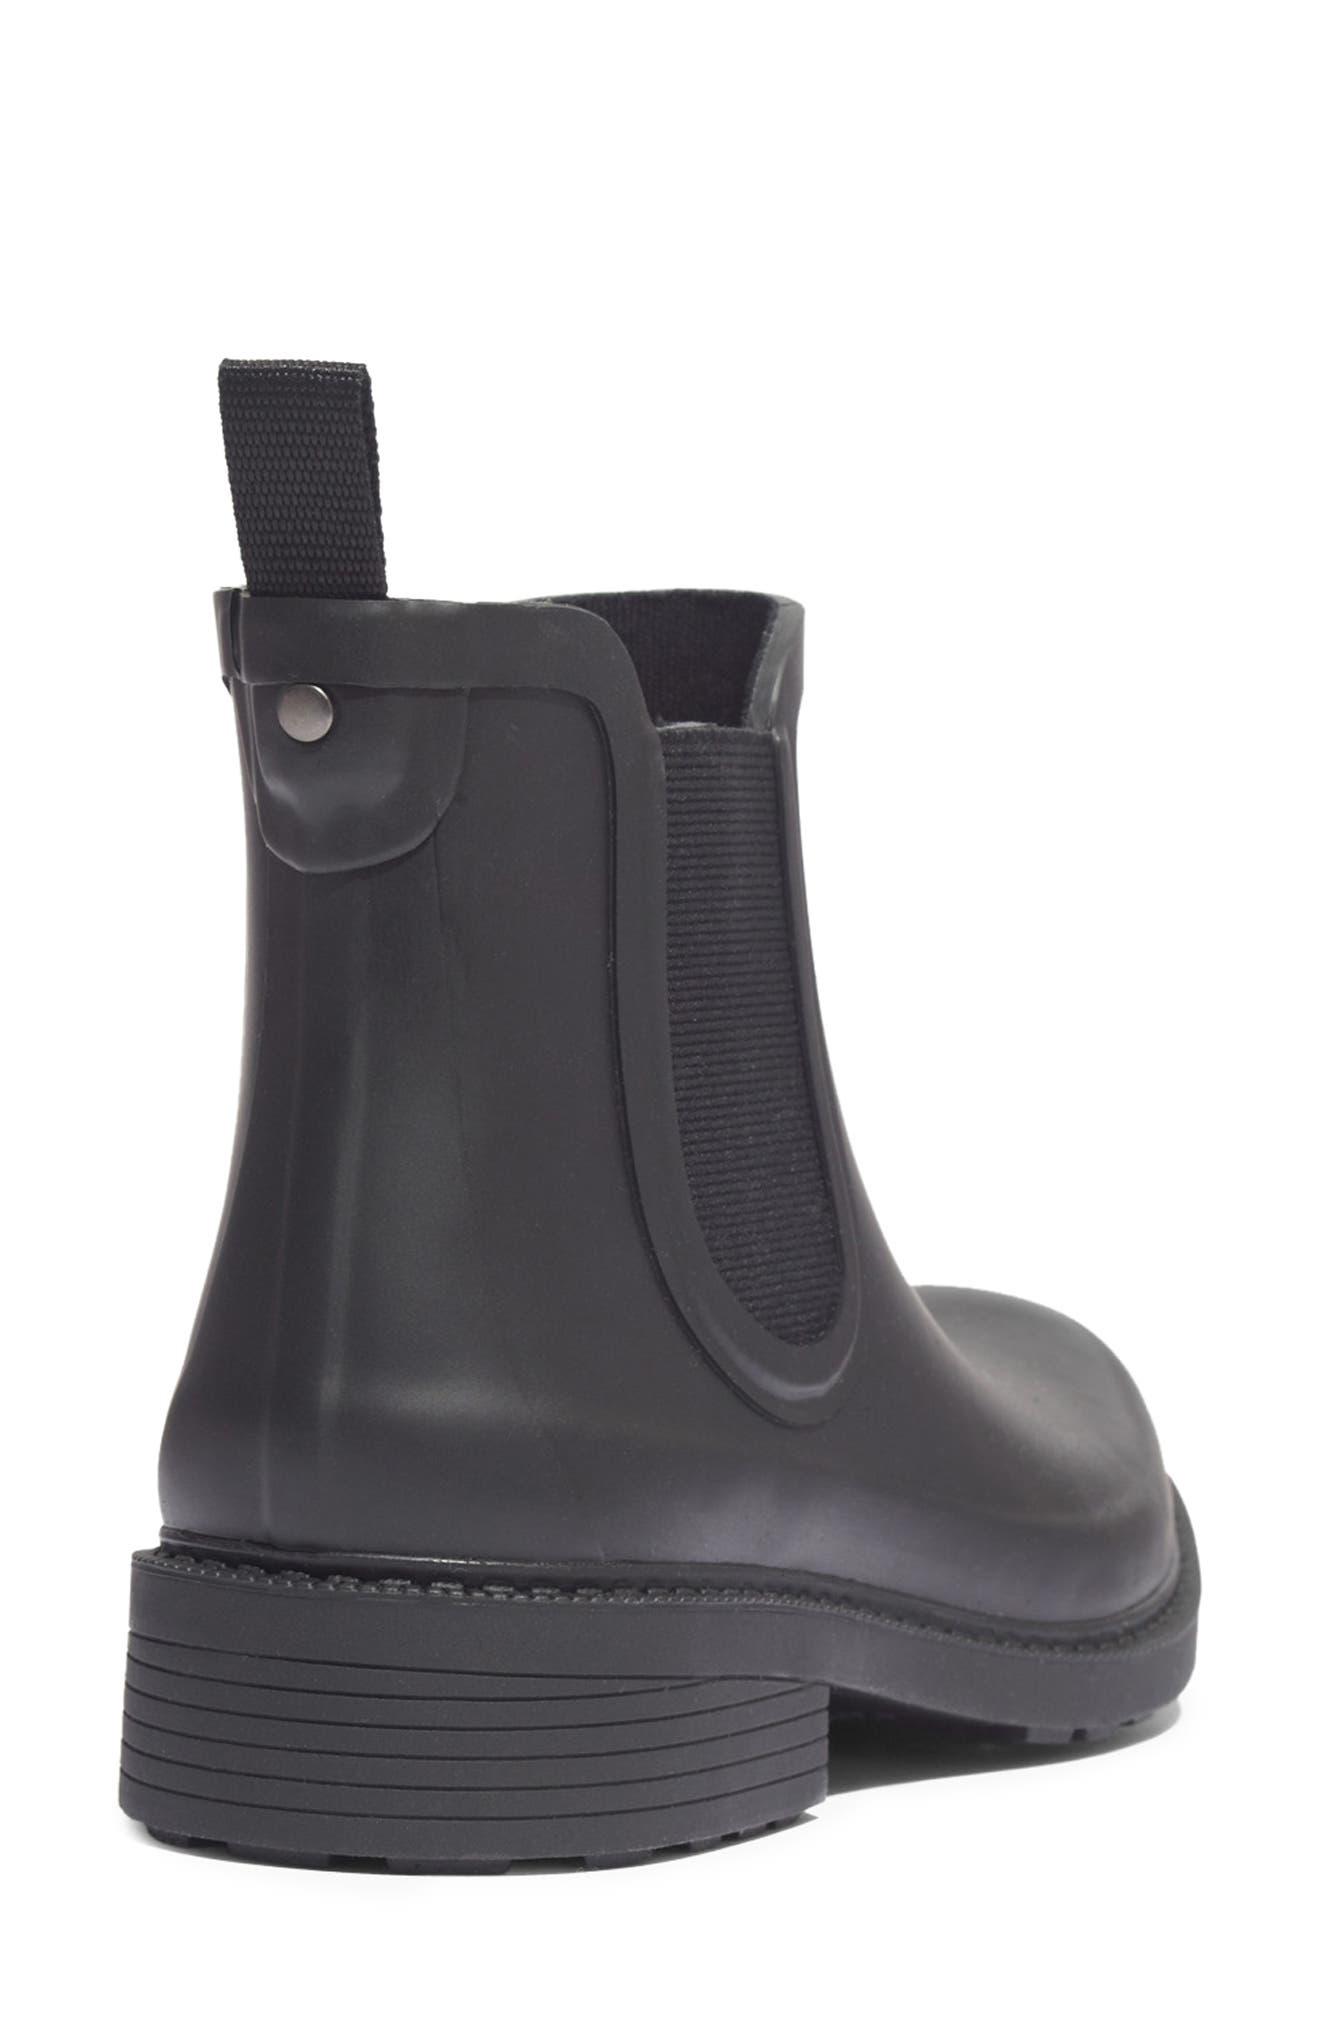 MADEWELL, The Chelsea Rain Boot, Alternate thumbnail 7, color, TRUE BLACK RUBBER